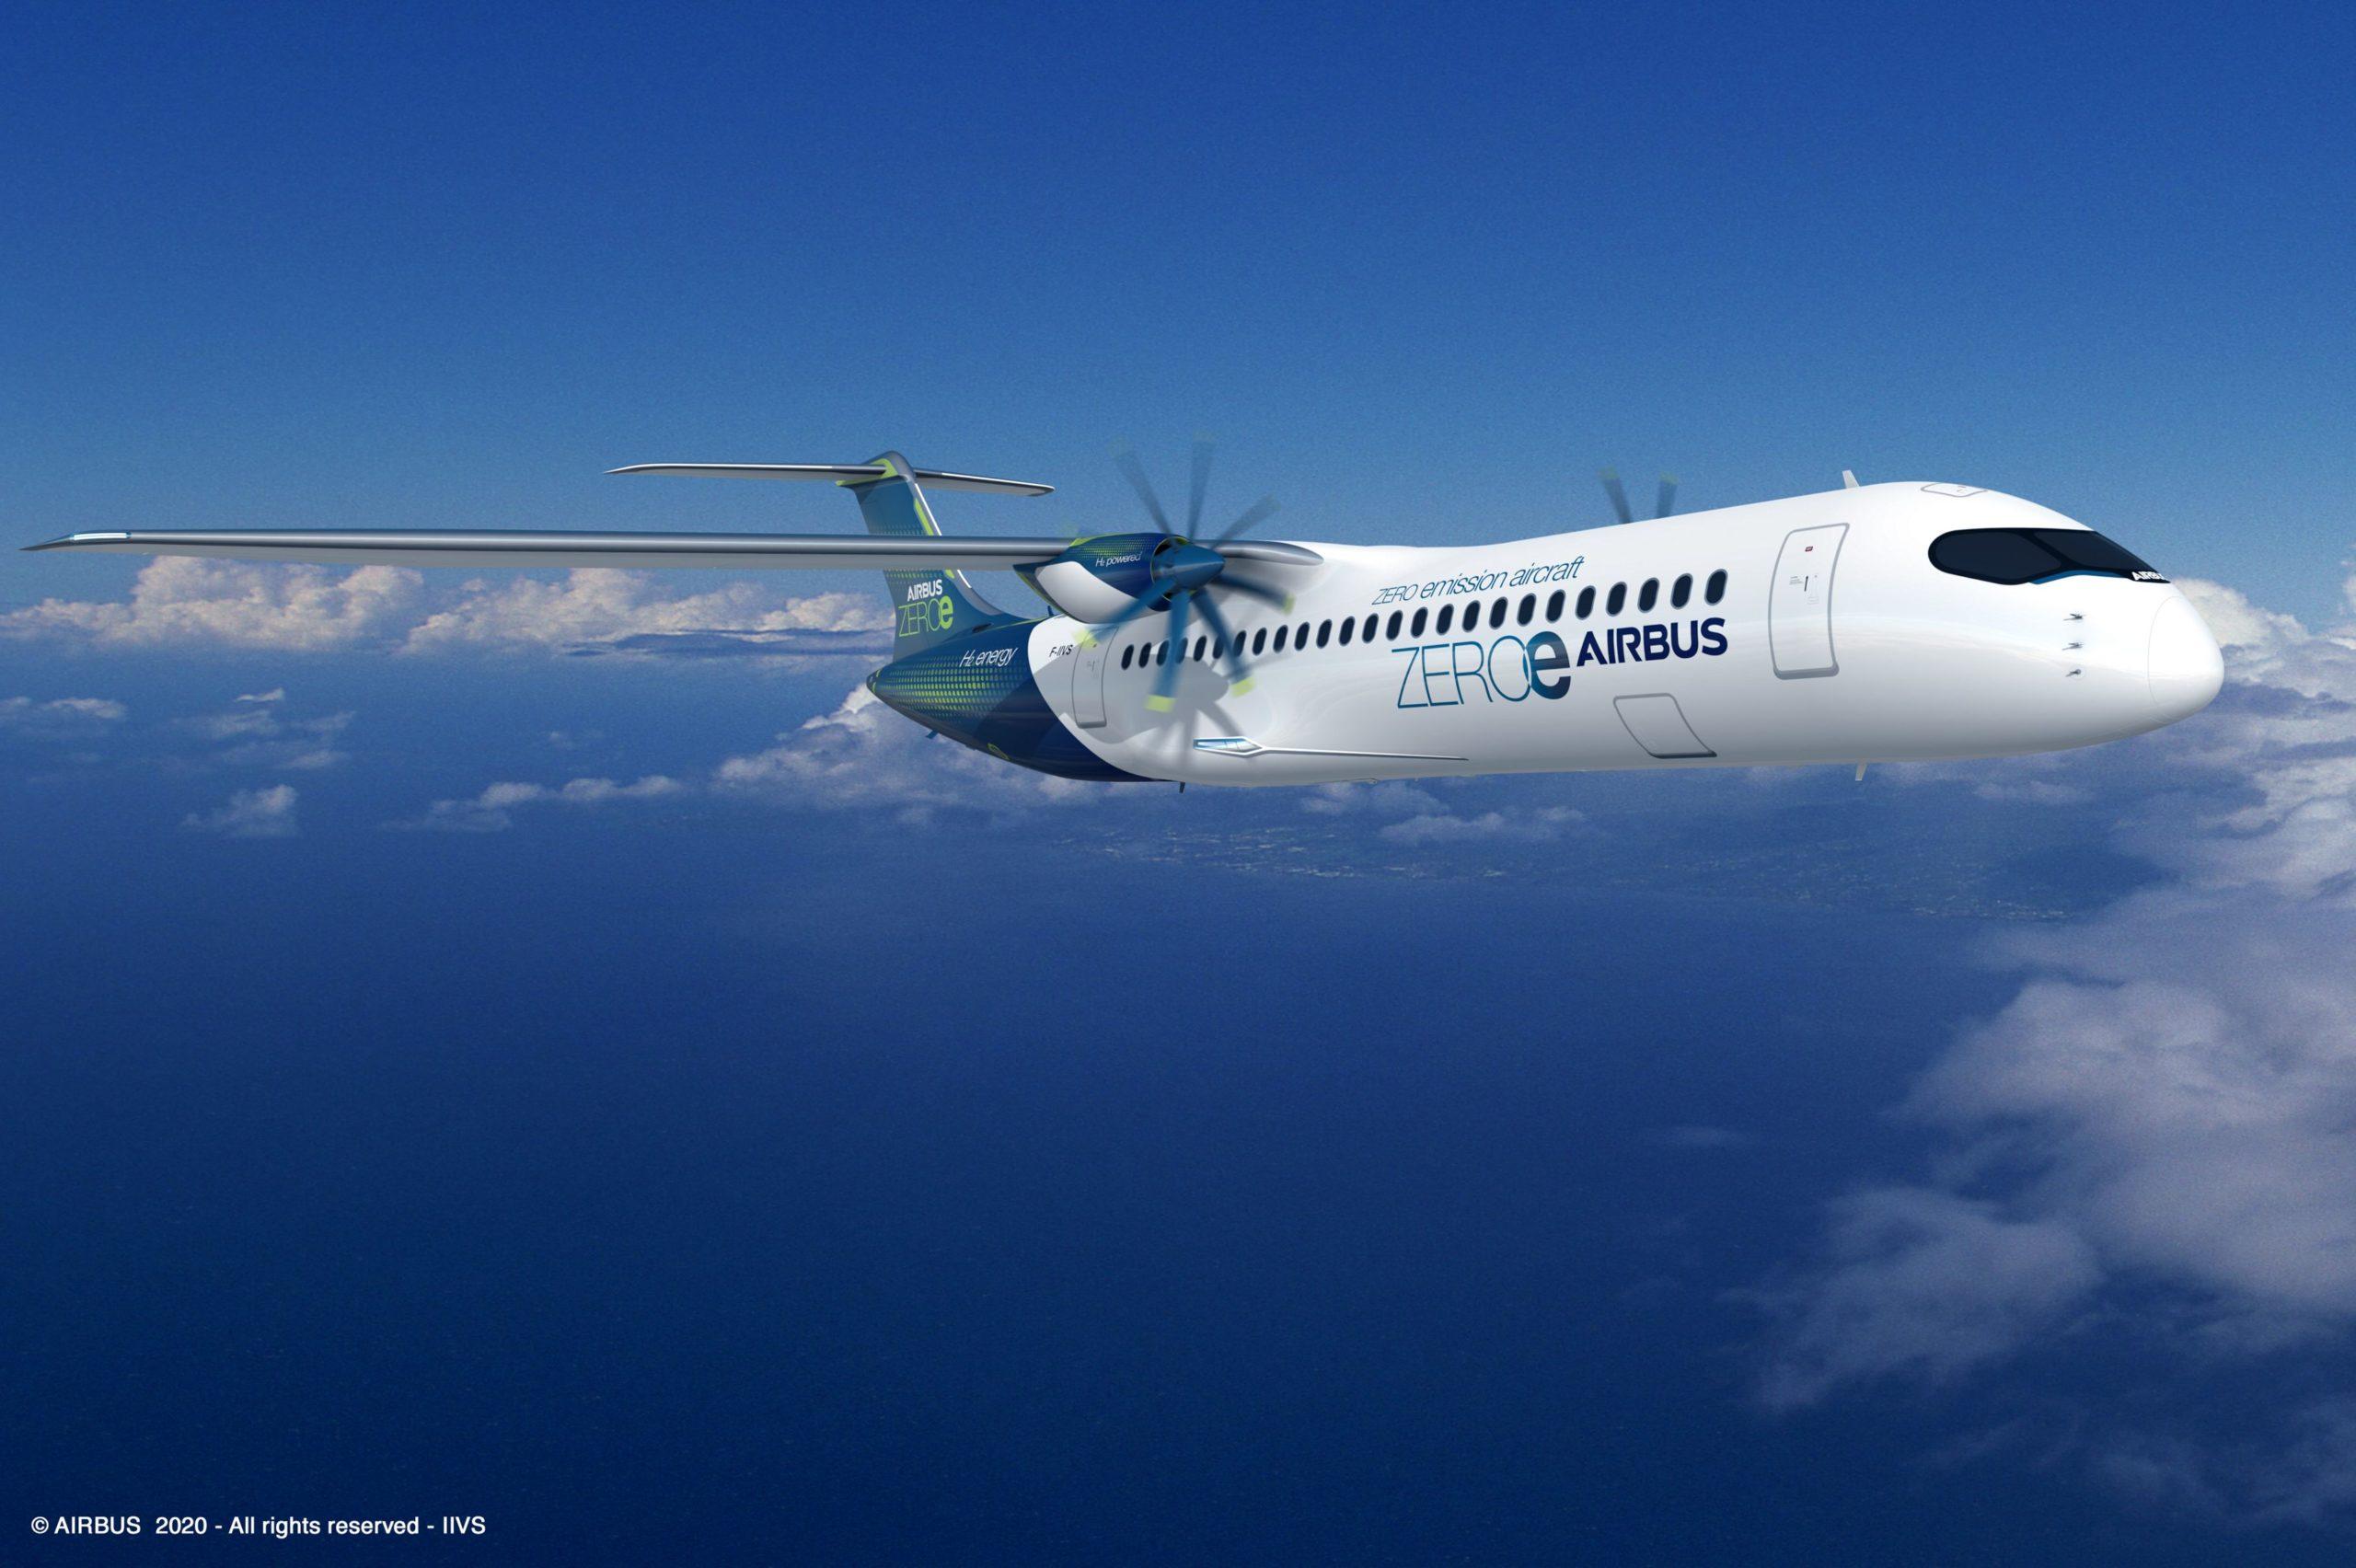 Airbus ZeroE turboprop